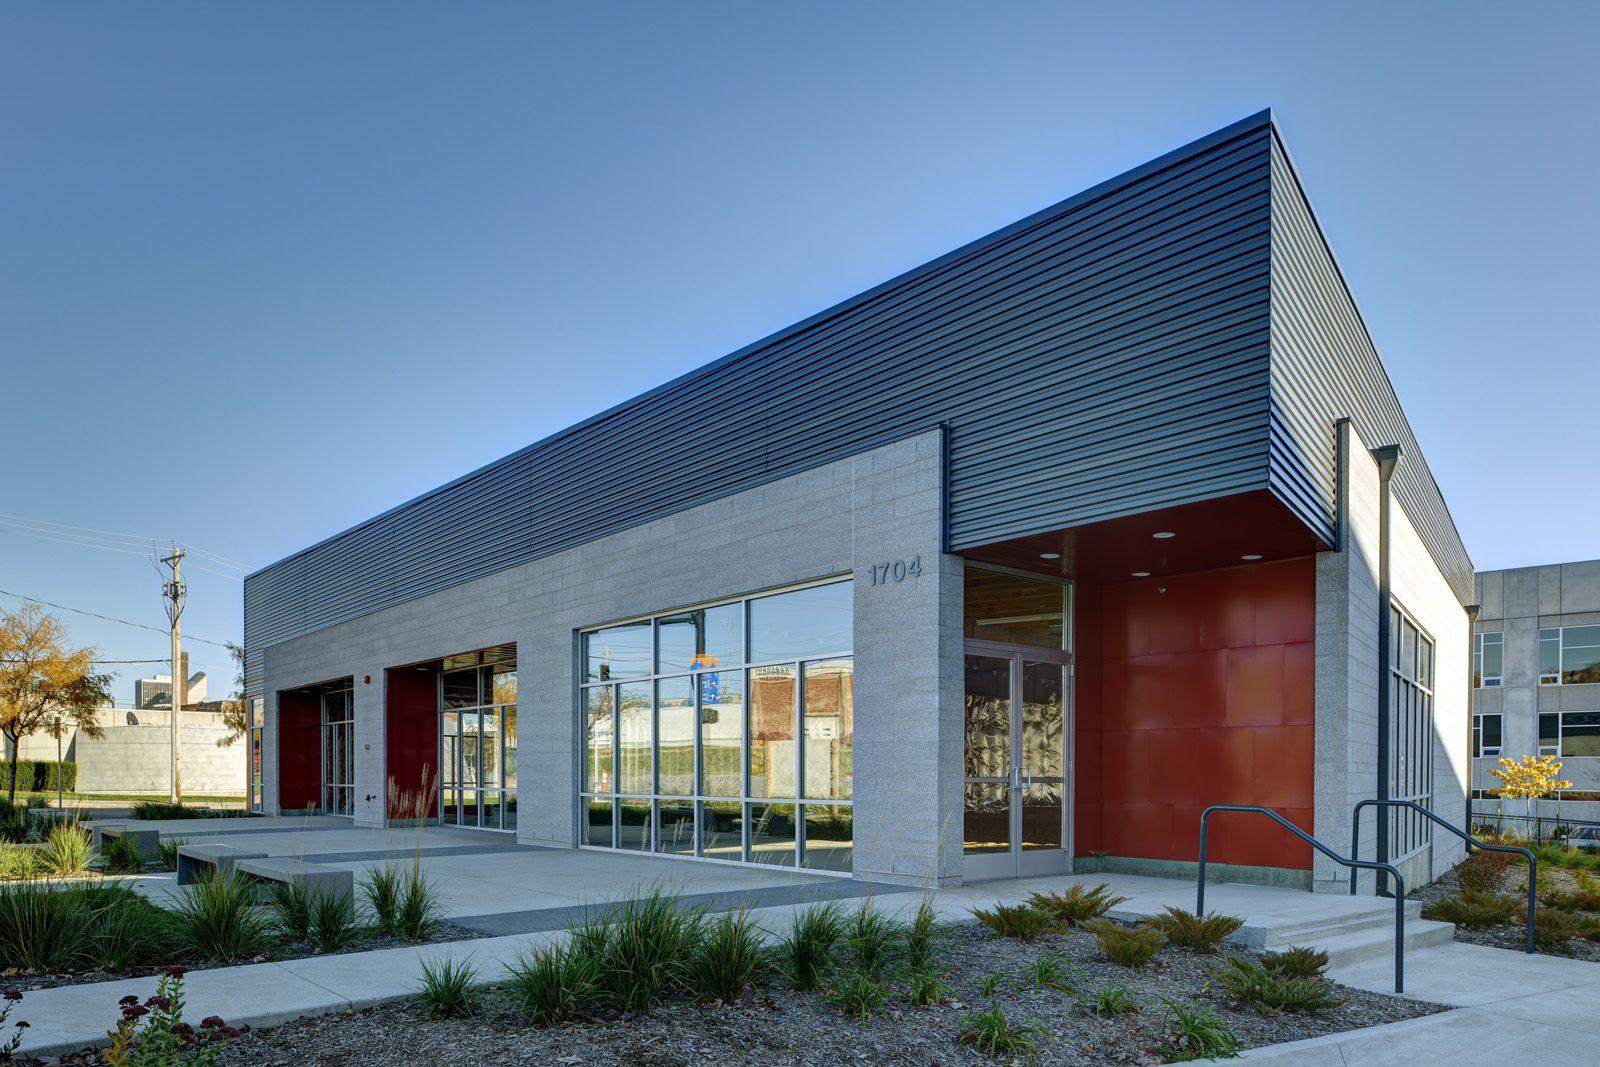 Gateway Retail | Slingshot Architecture | ARCHITECTURE | Pinterest ...